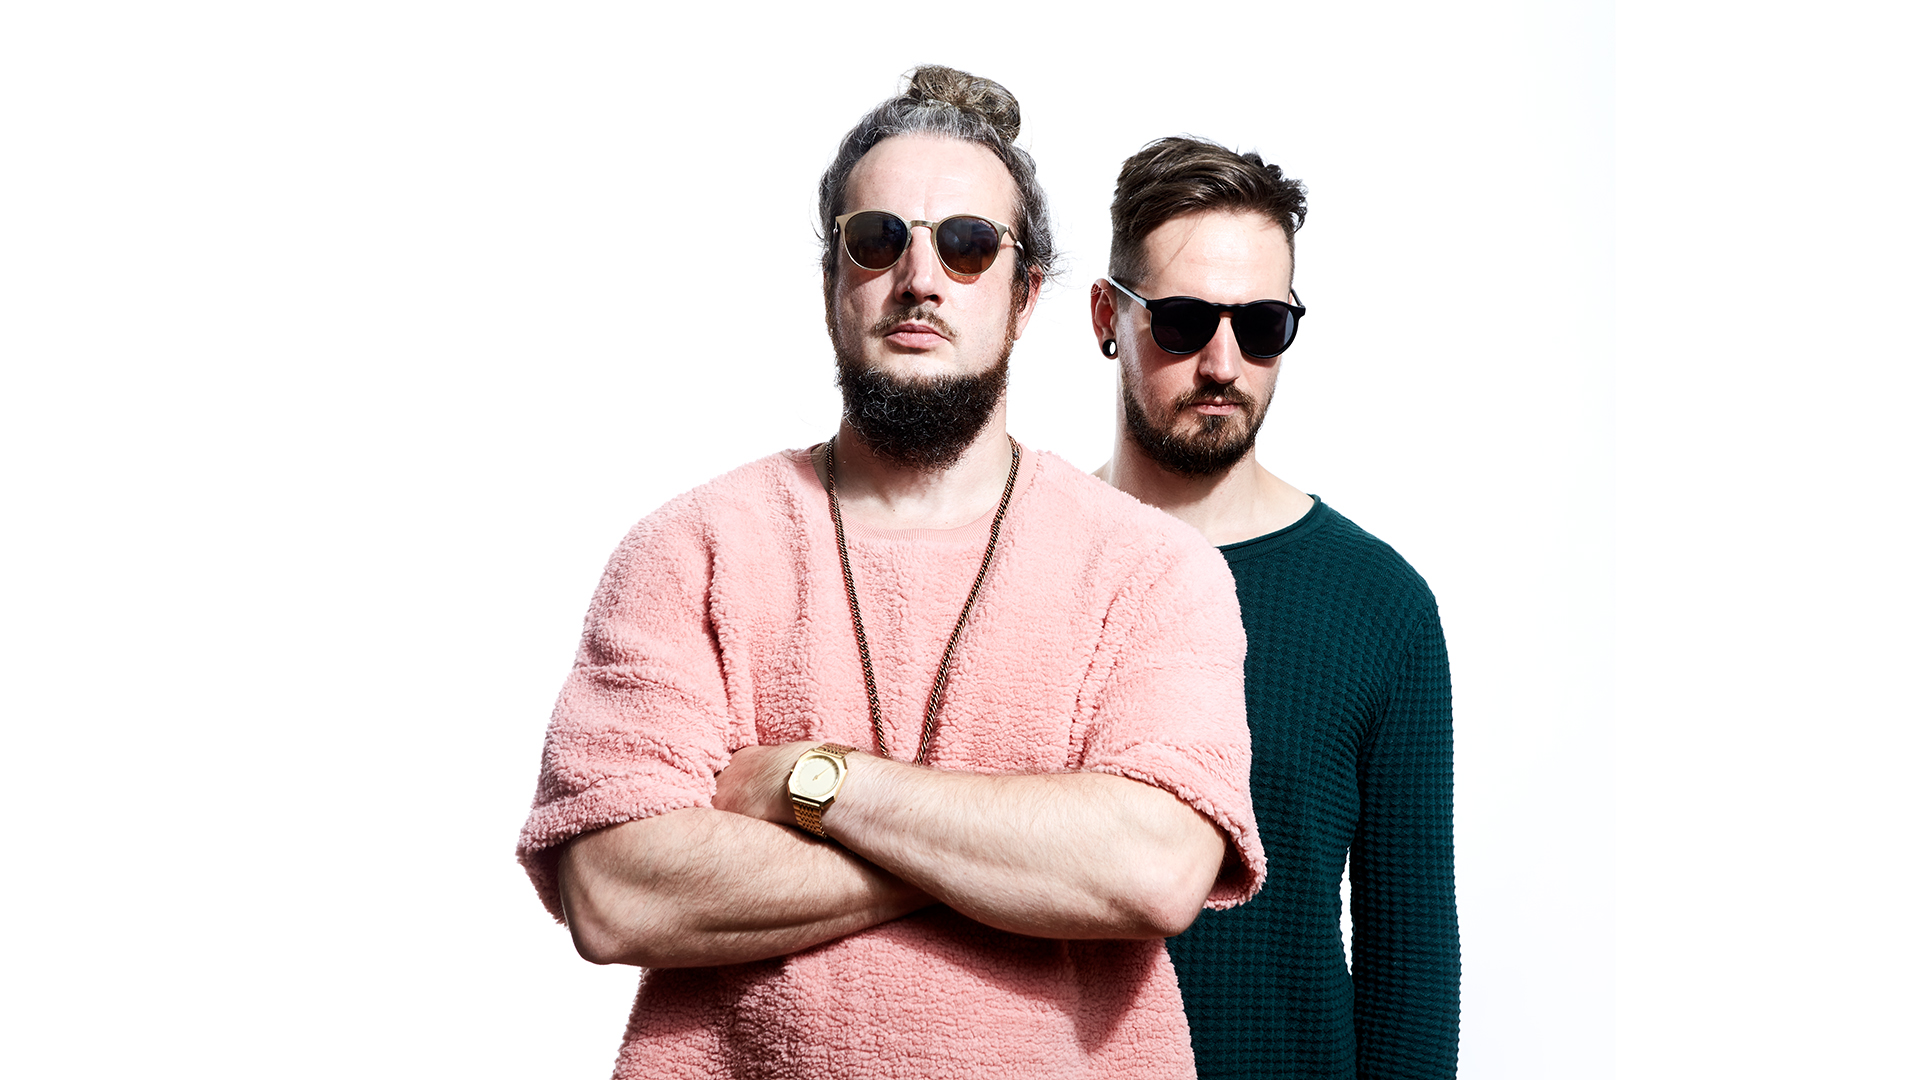 interview monkey safari electronic music industry music savage thrills savagethrills 1